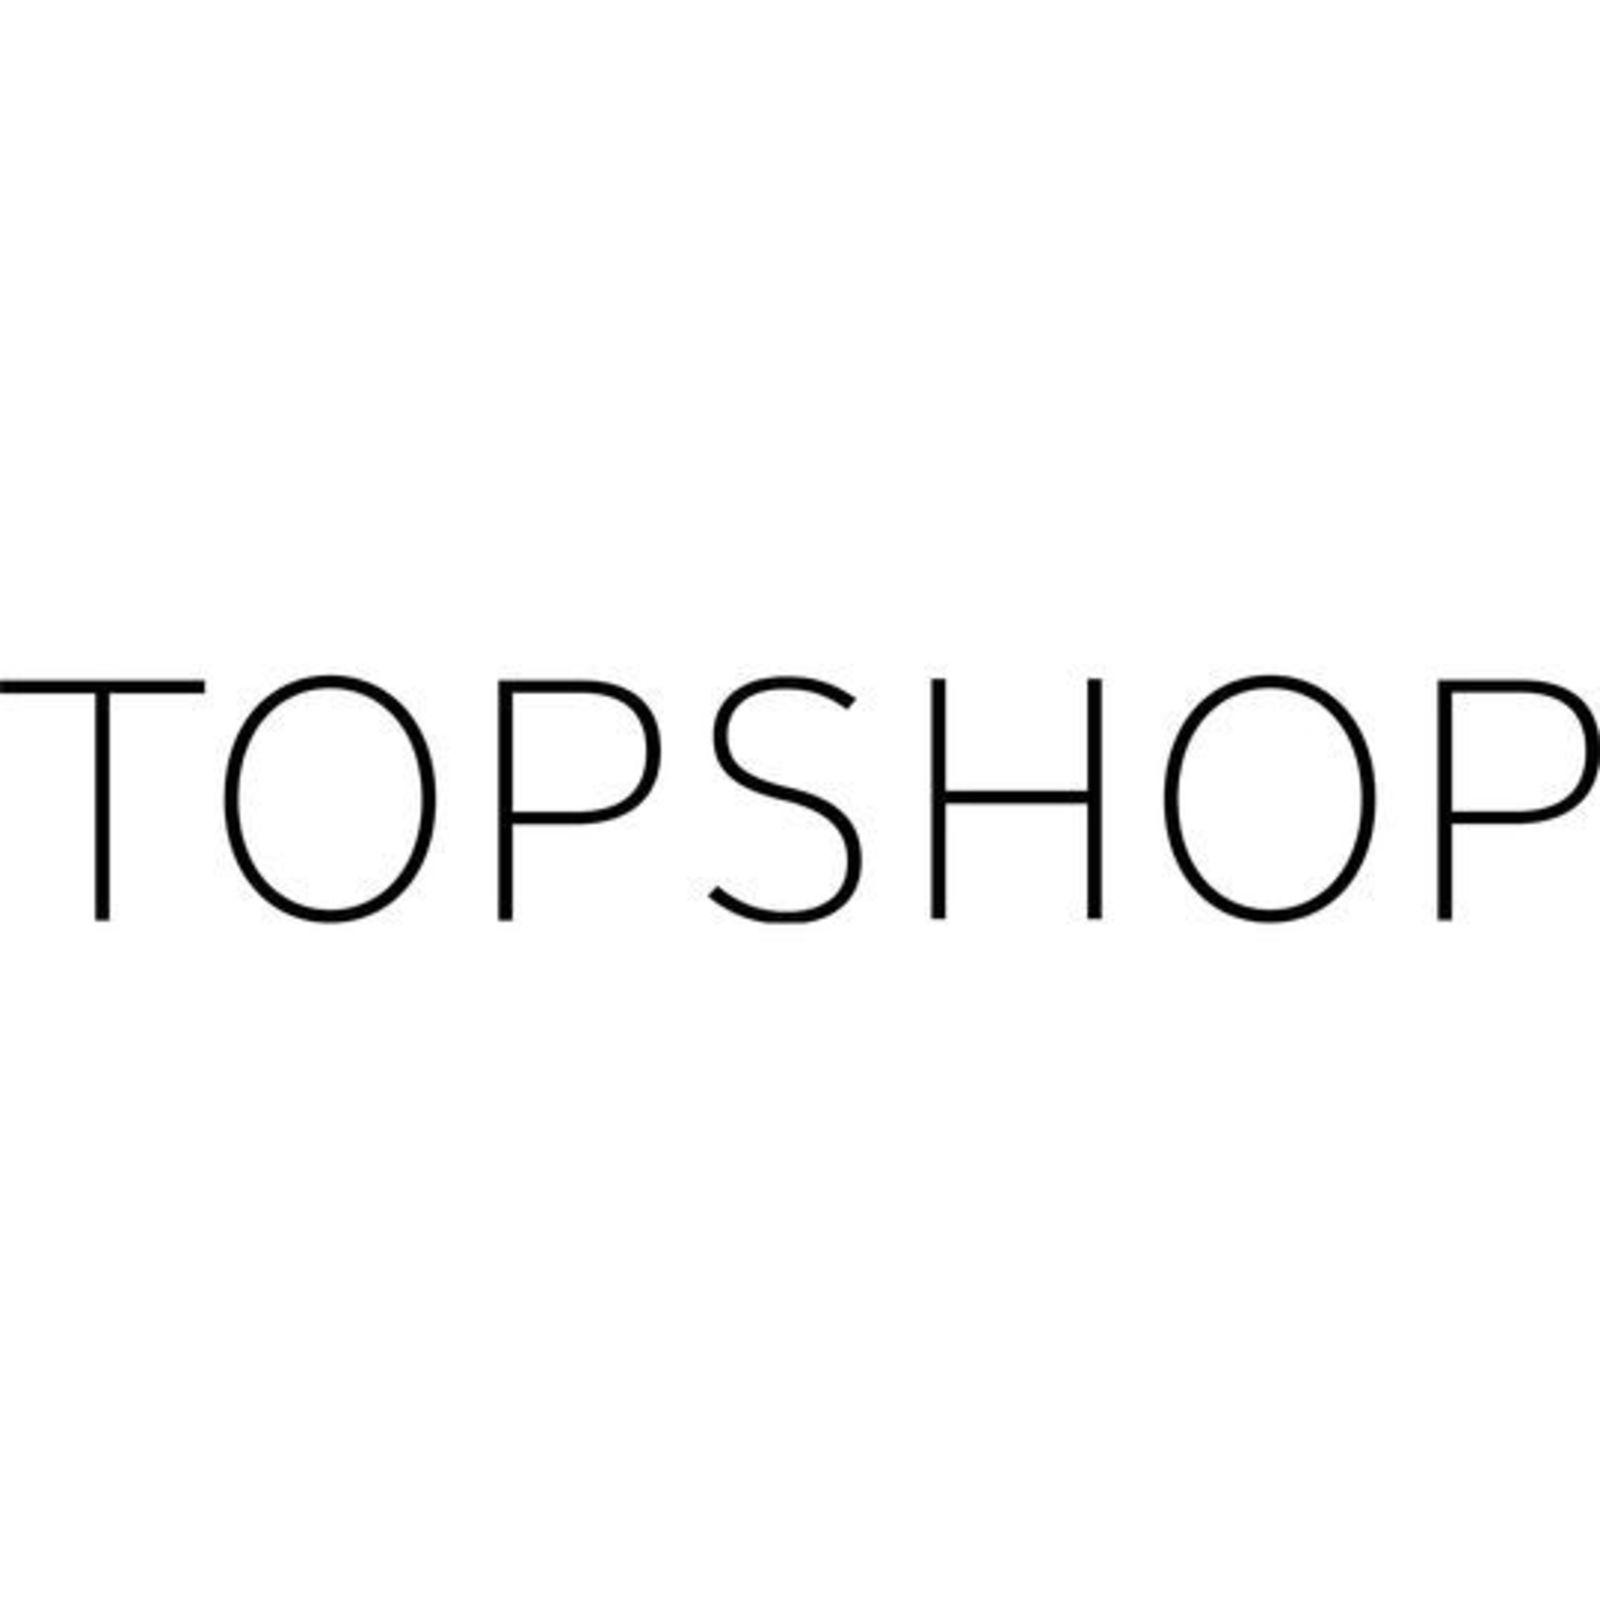 TOPSHOP (Image 1)